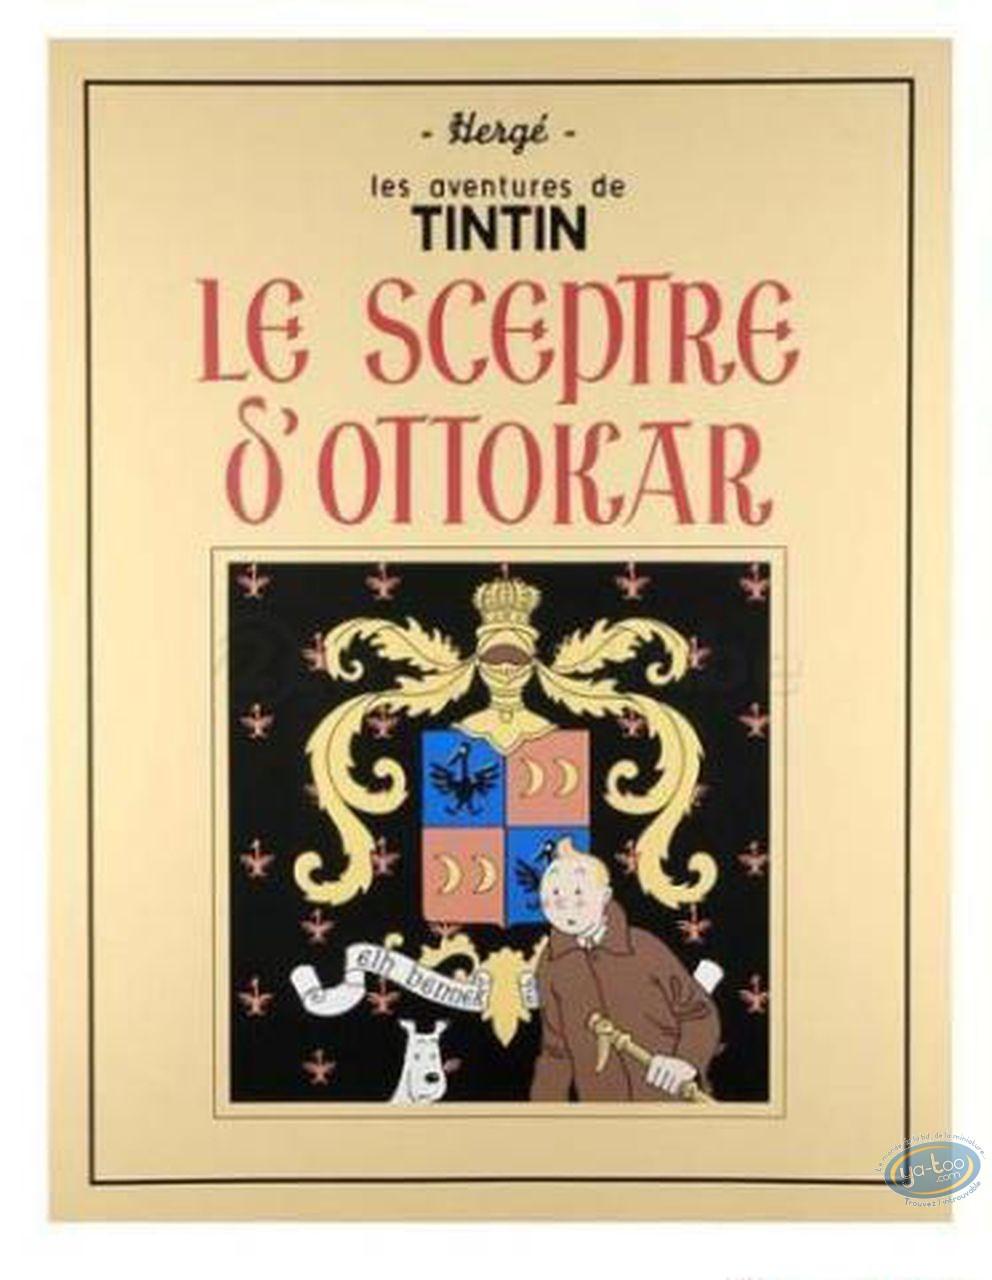 Serigraph Print, Tintin : King Ottokar's Sceptre